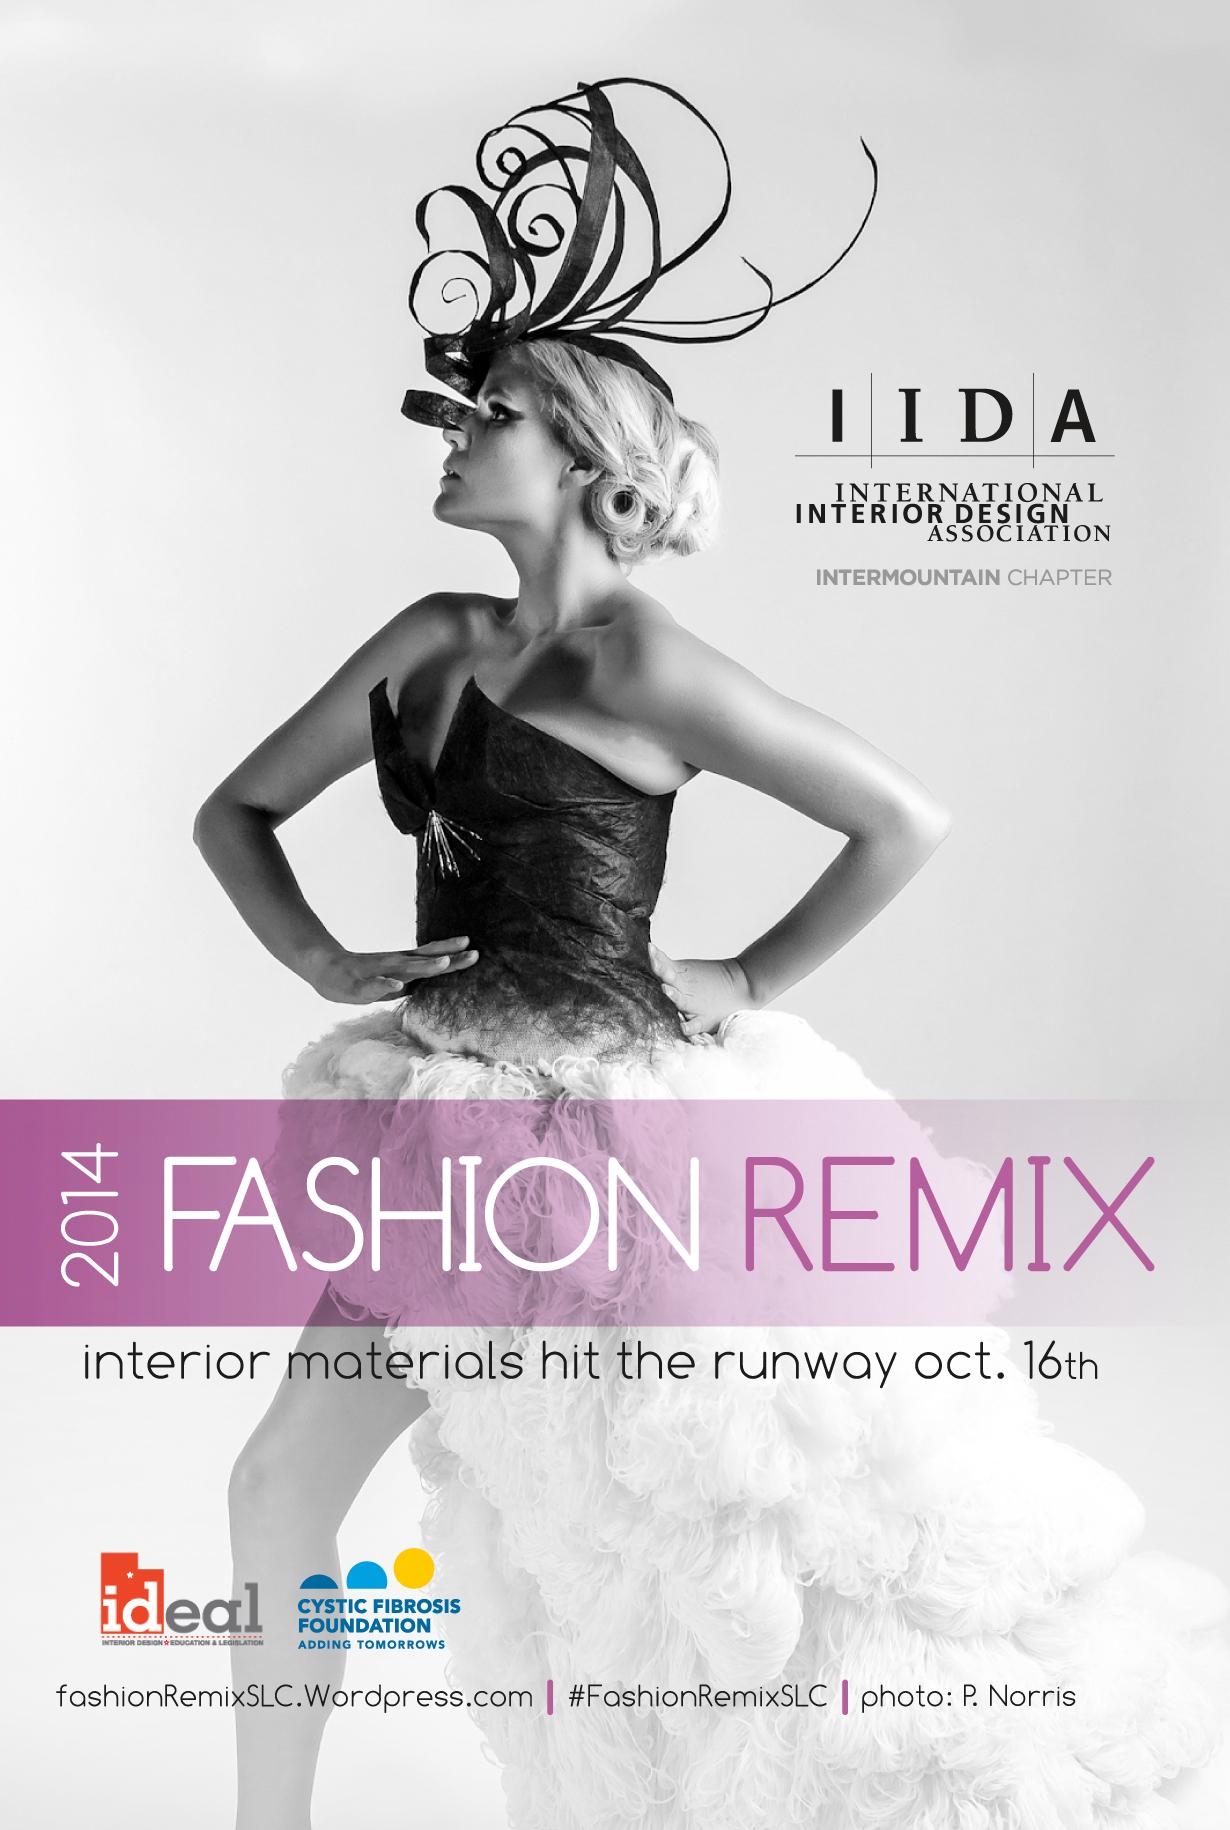 fashion remix 2014 rail event center salt lake city